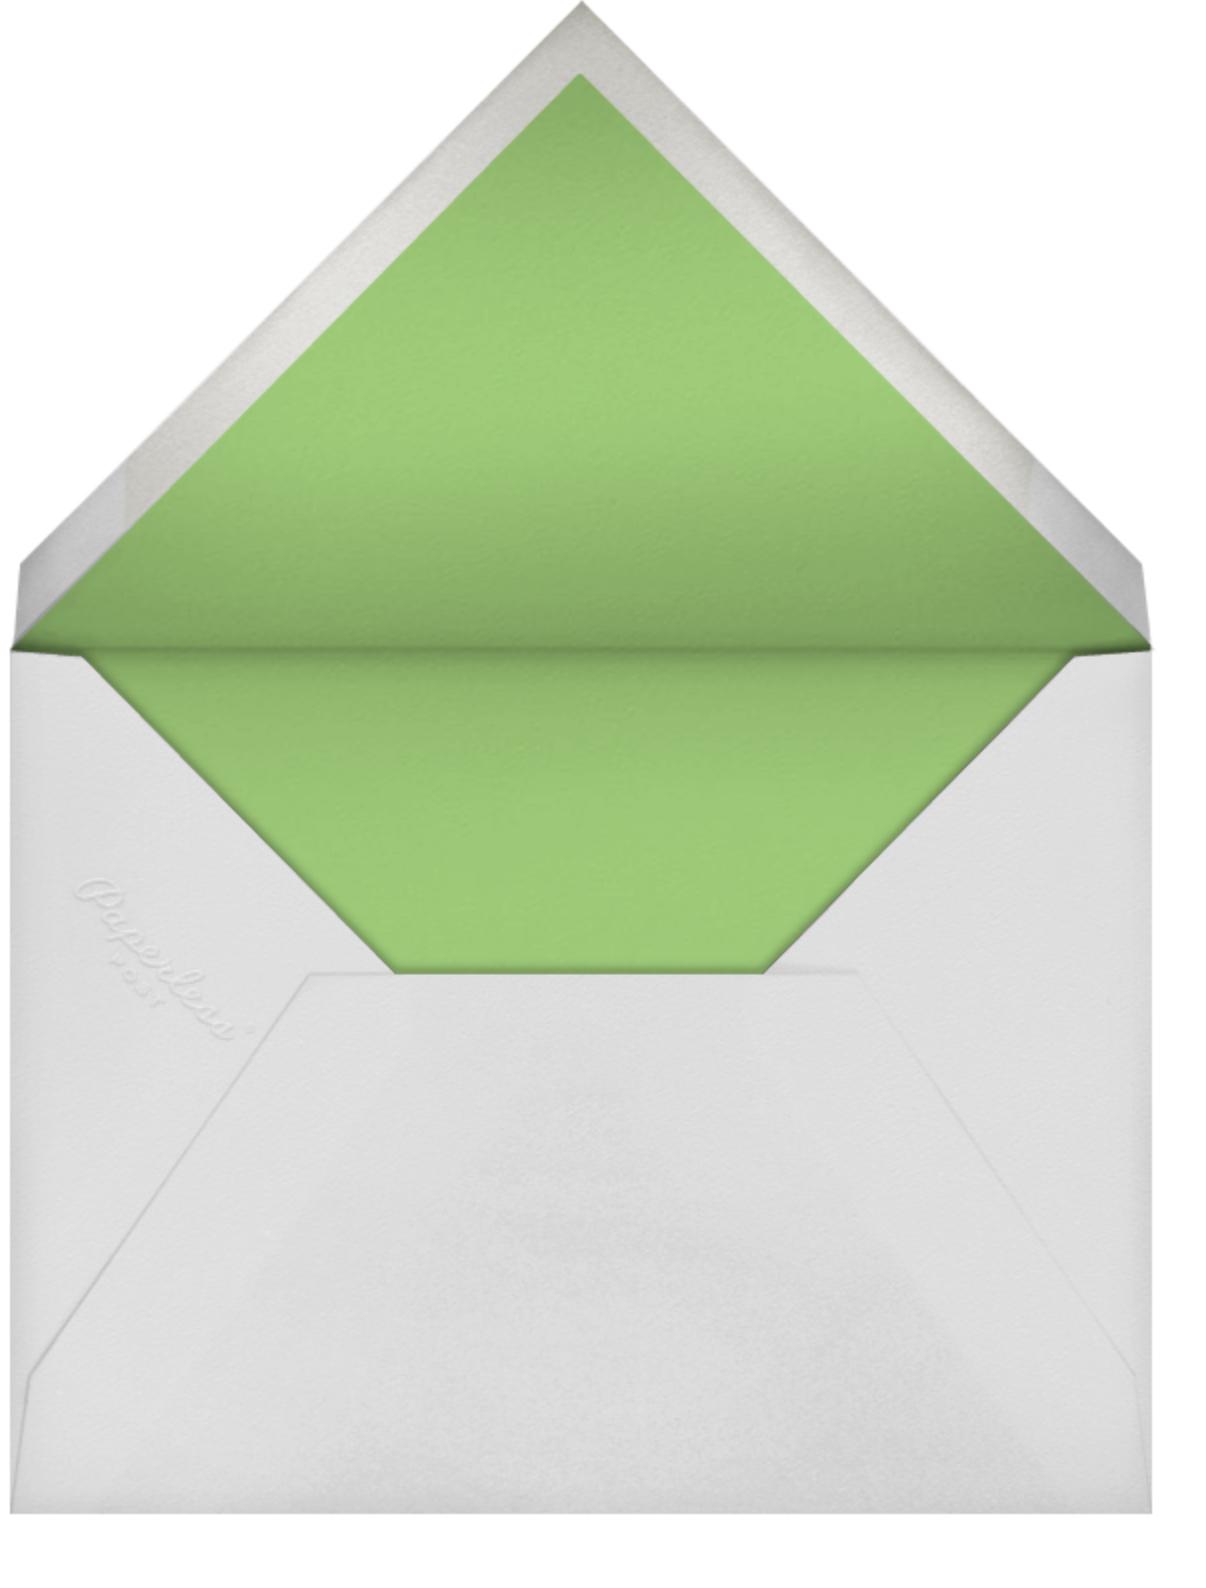 Kitchen Shelves (Invitation) - kate spade new york - Housewarming - envelope back